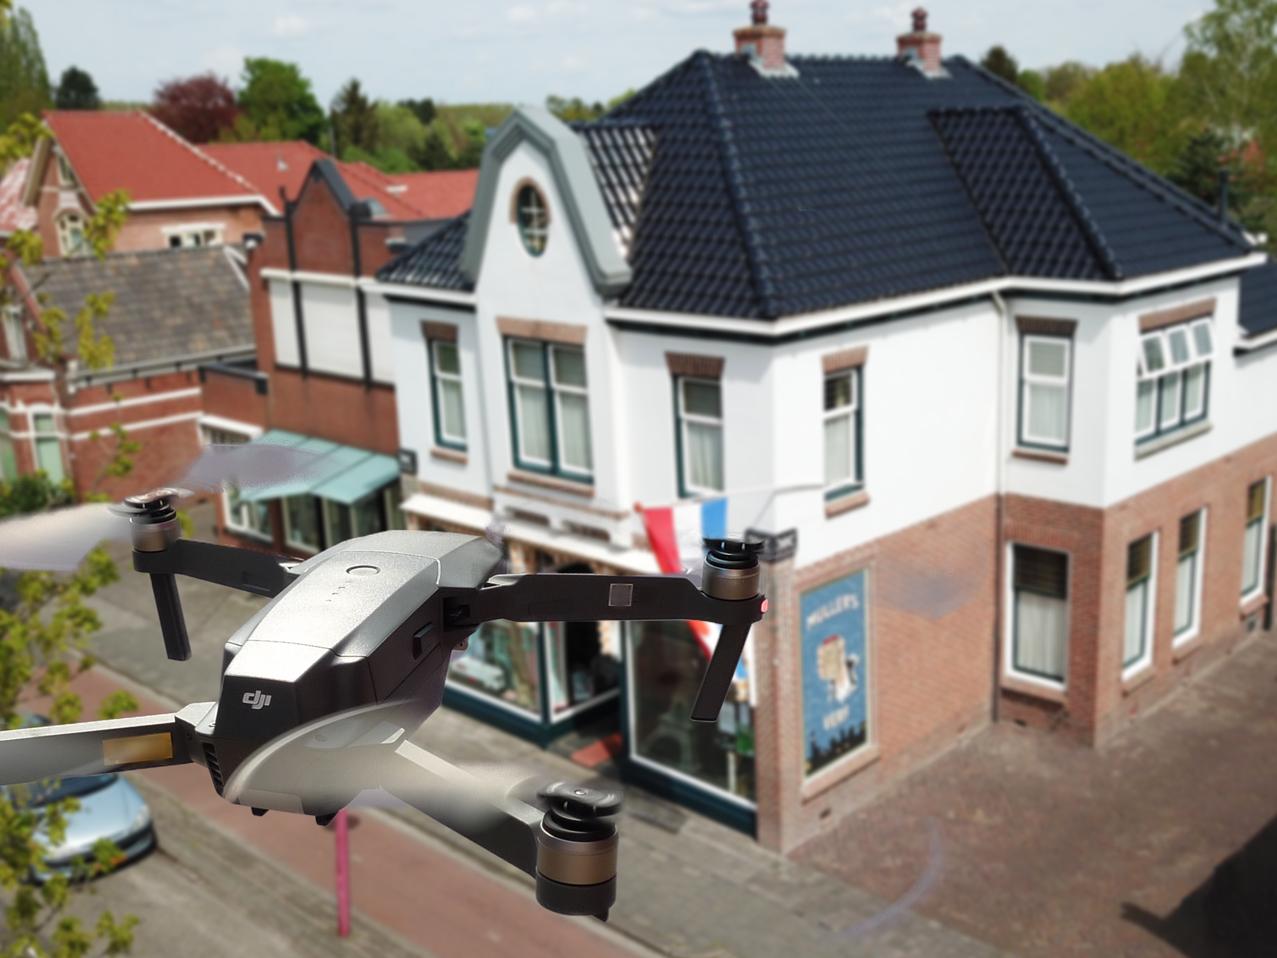 De professionele drone kan videos en fotos maken van panden